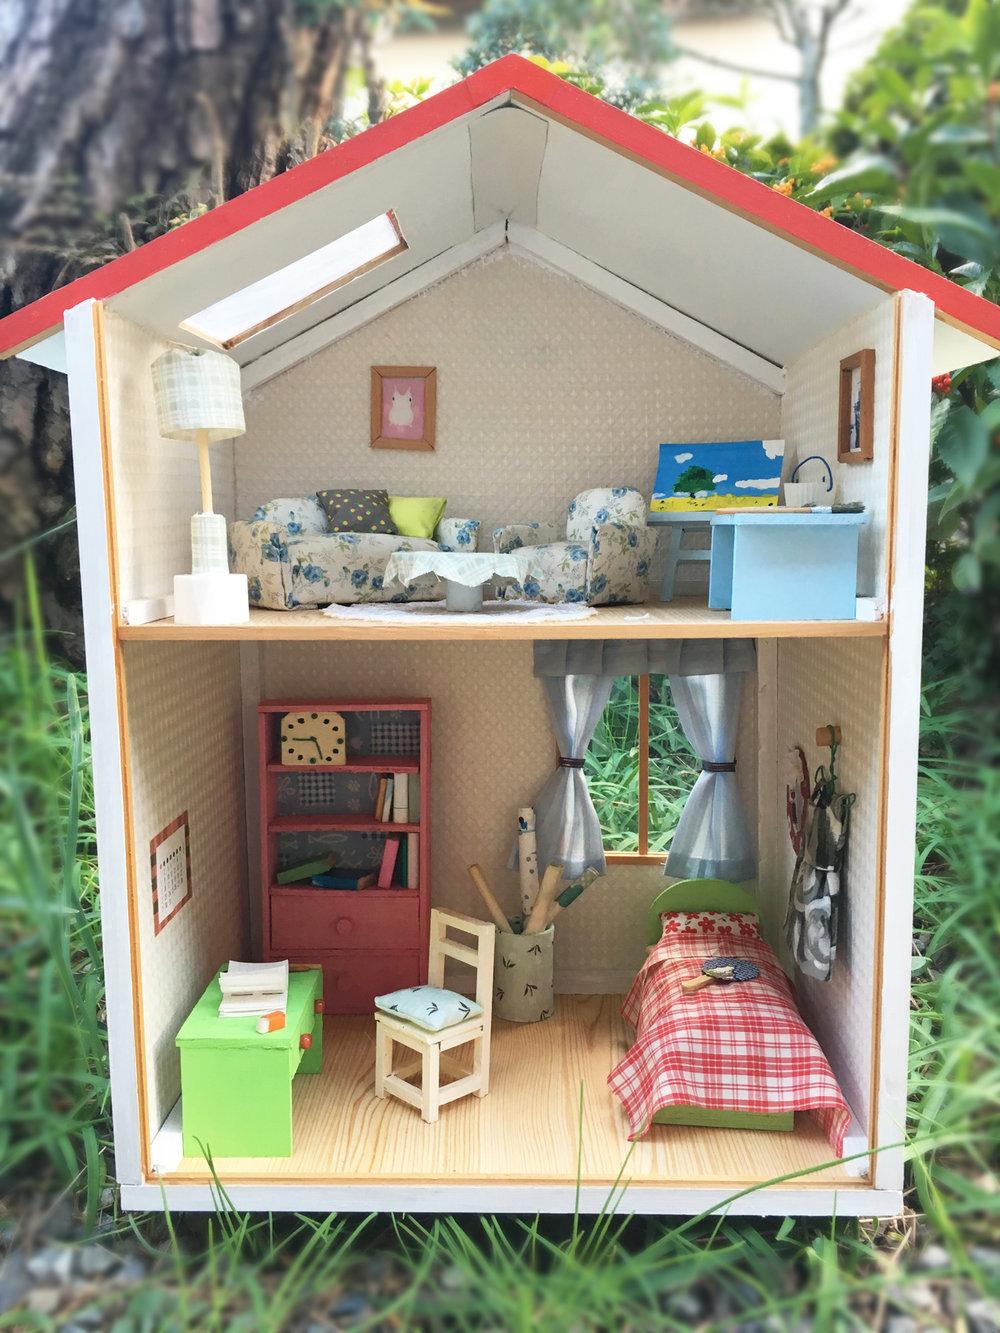 My miniature house